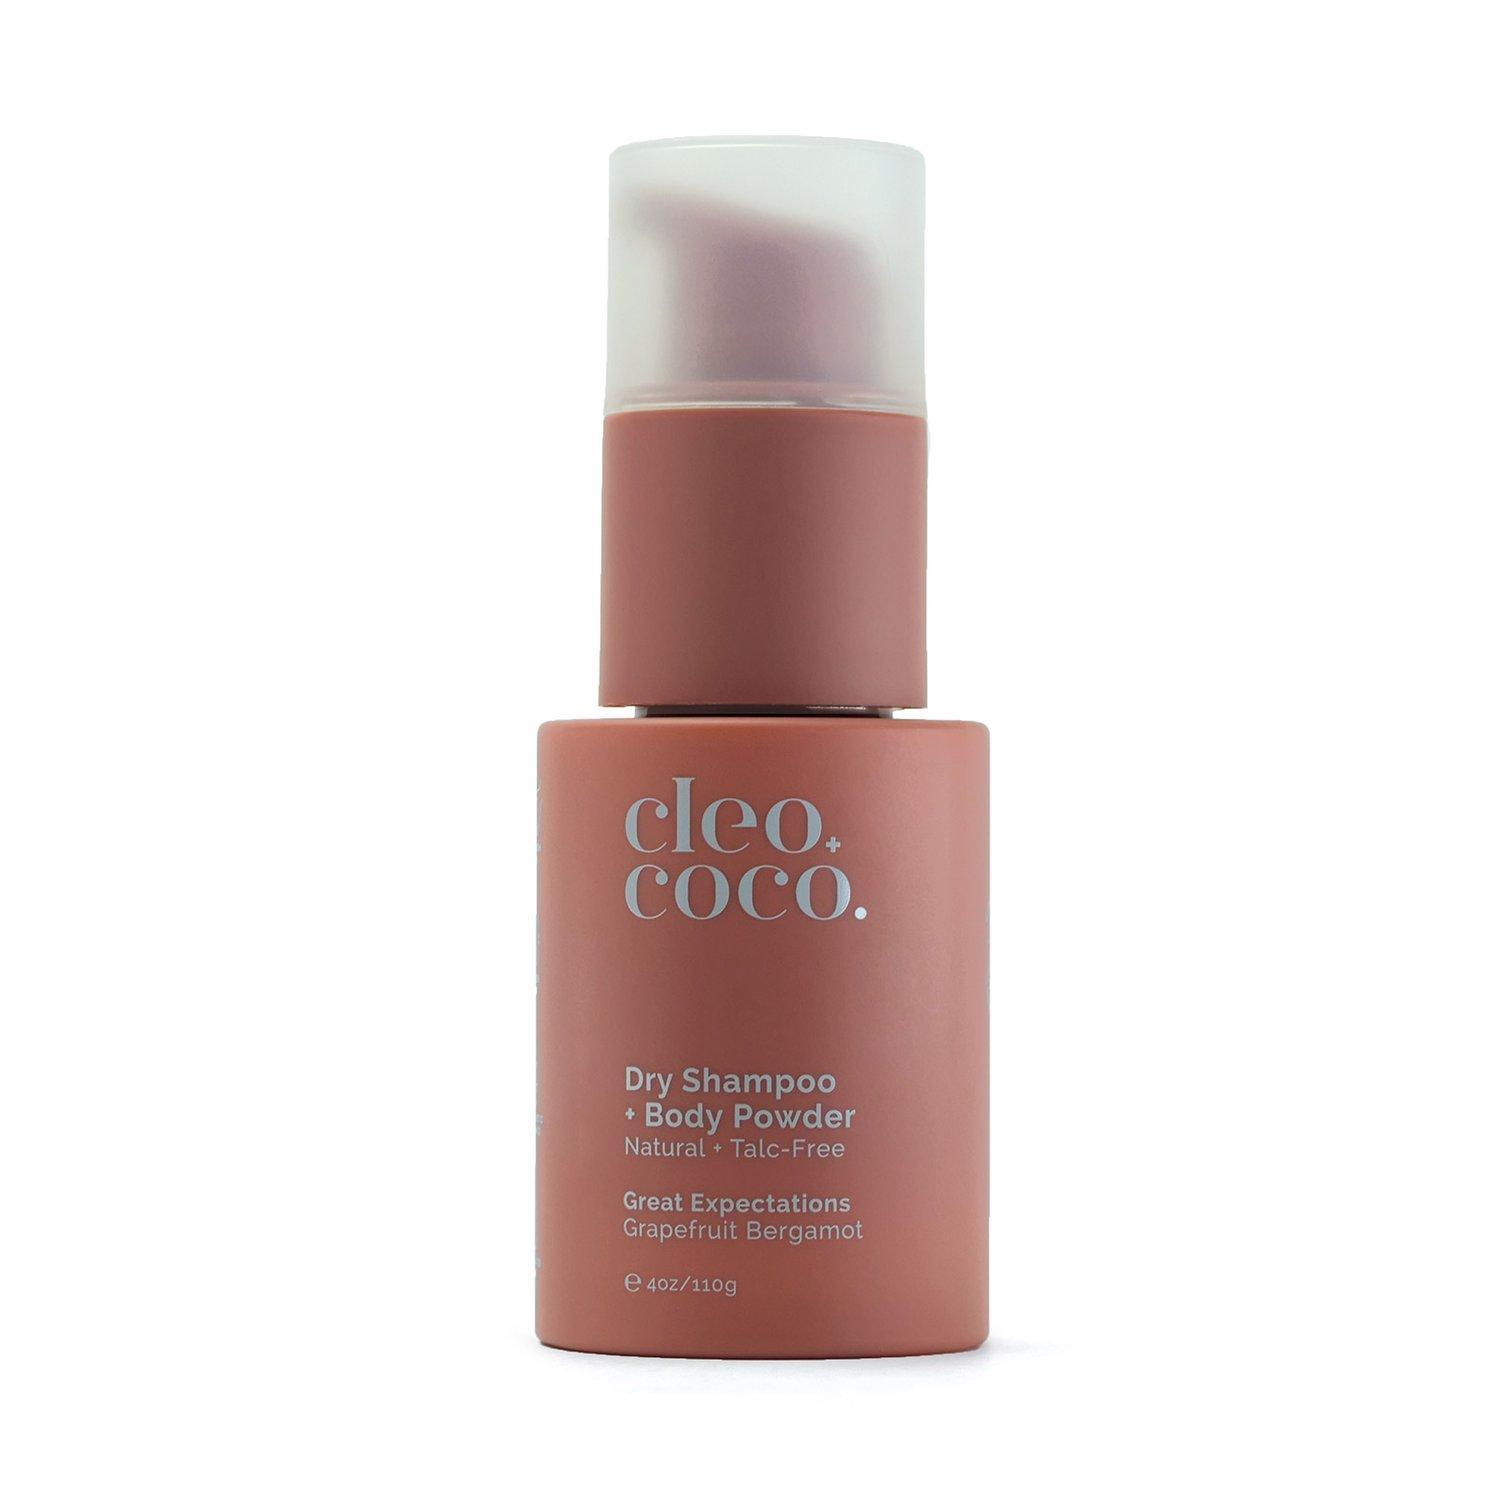 Grapefruit and Bergamot Dry Shampoo + Body Powder